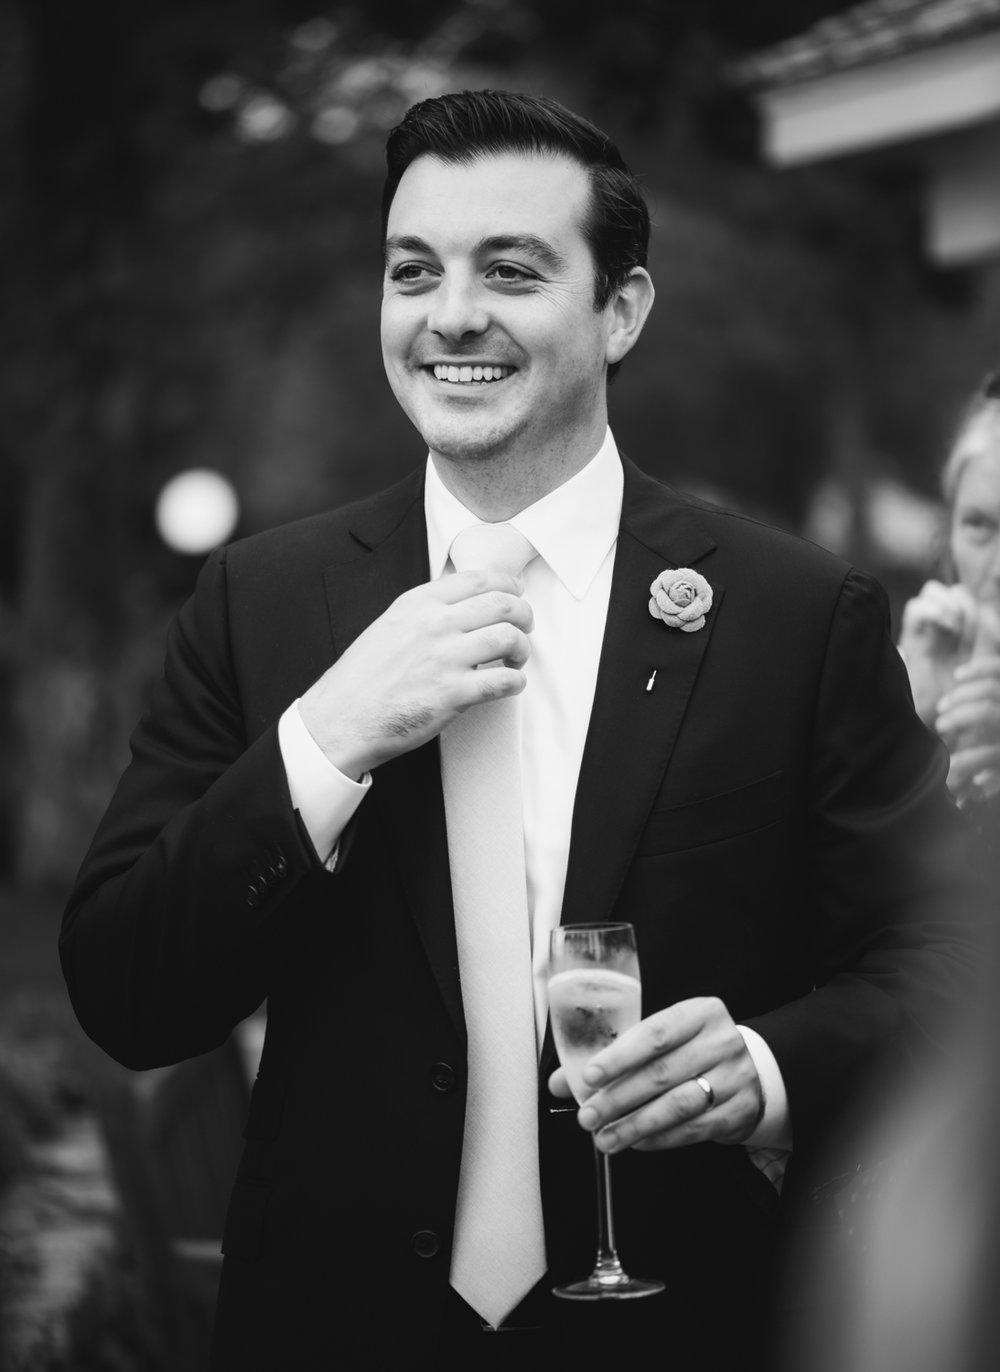 maureen_evan_wedding_marthas_vineyard-3974.jpg